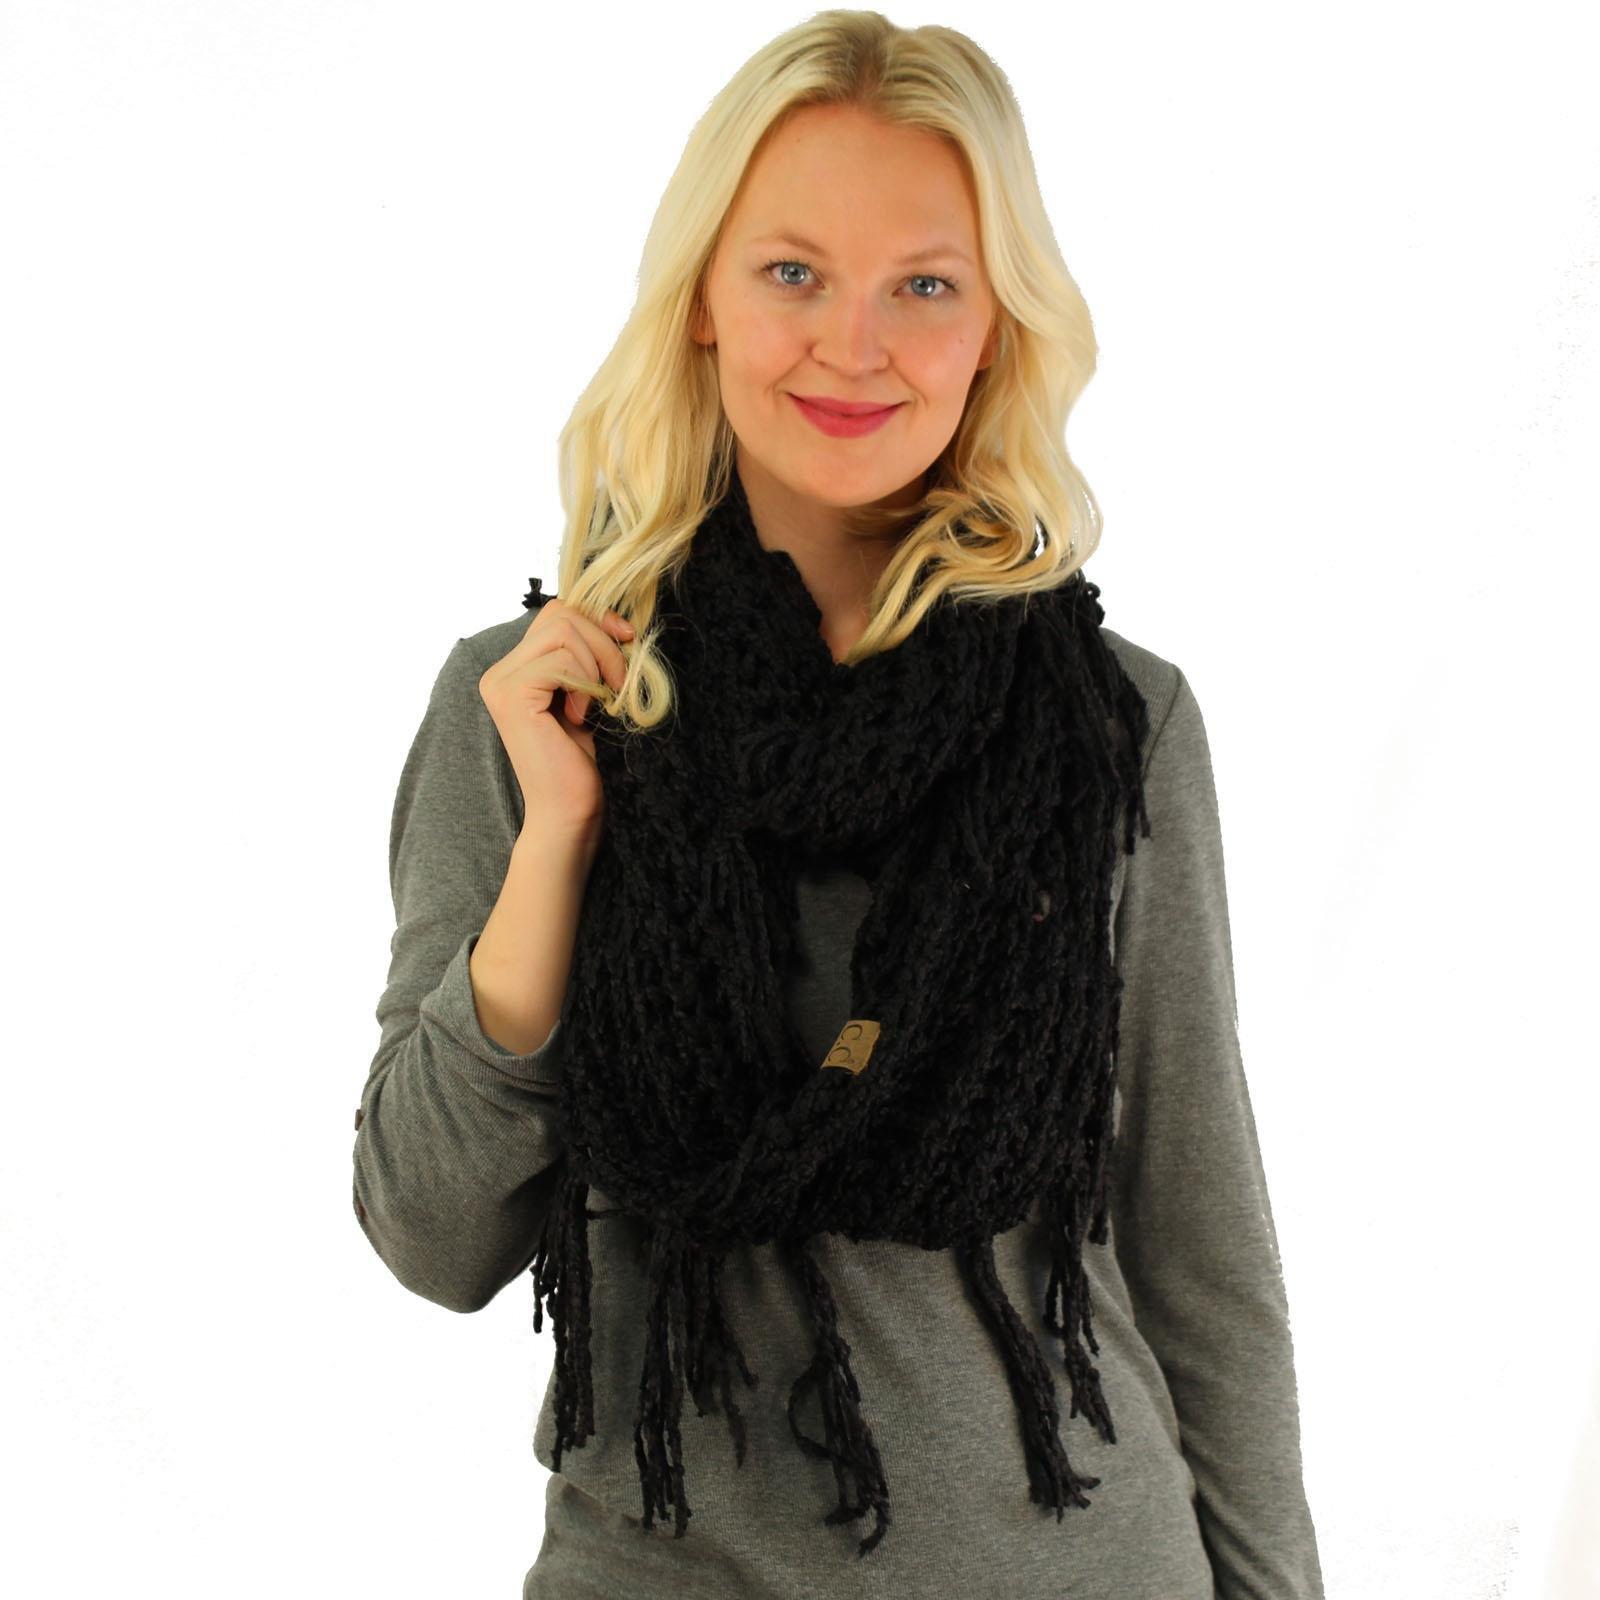 Winter CC Soft Chenille Net Tassle Fringe Thick Knit Infinity Scarf Wrap Black